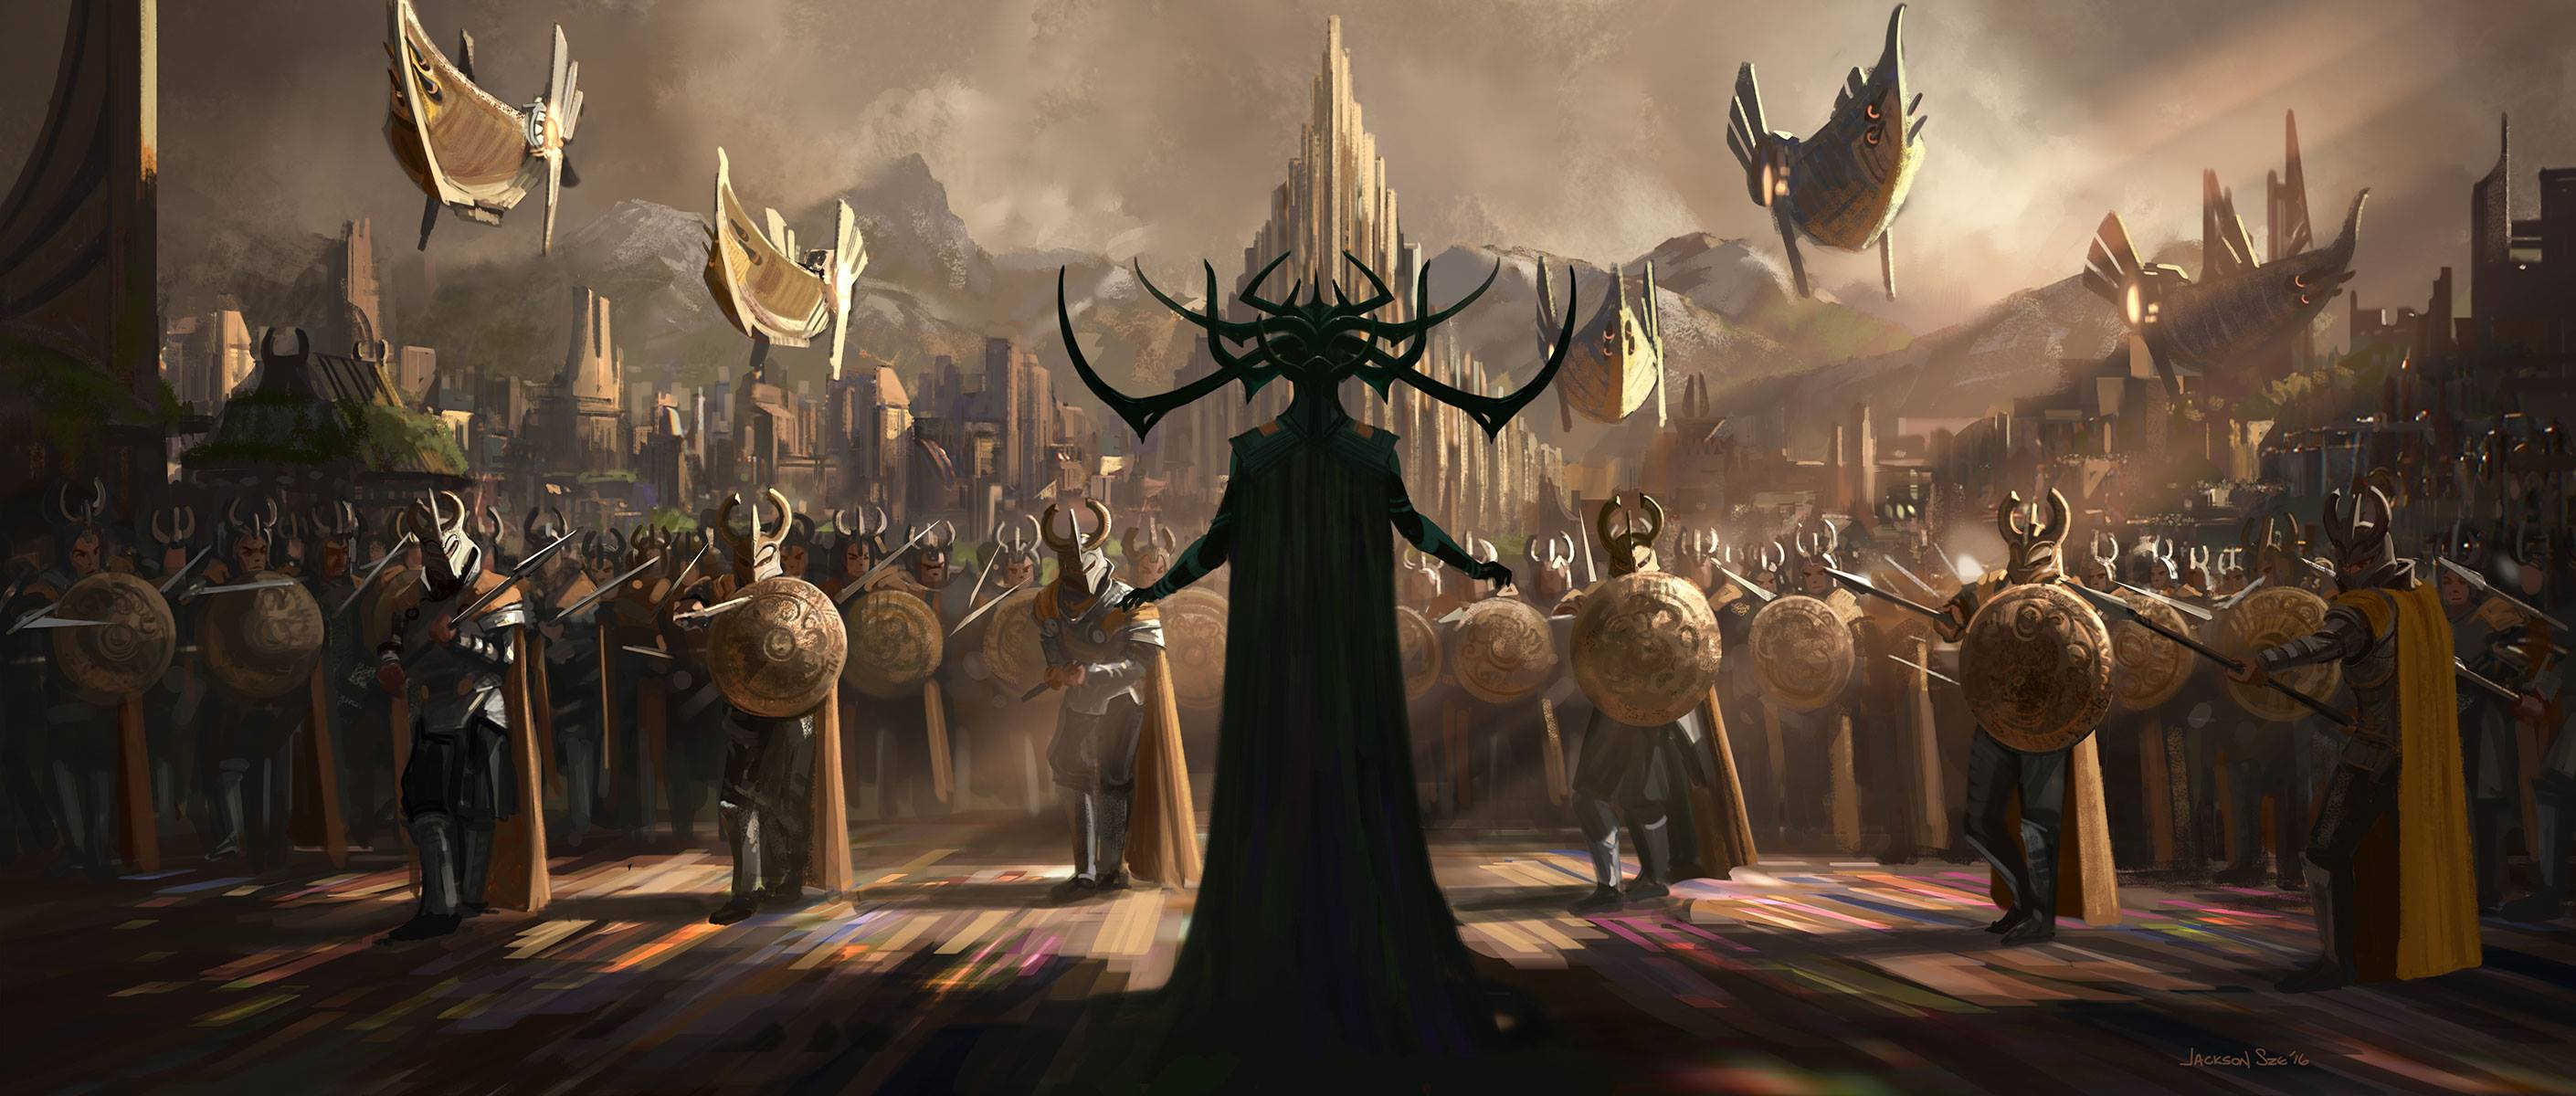 Thor: Ragnarok Background